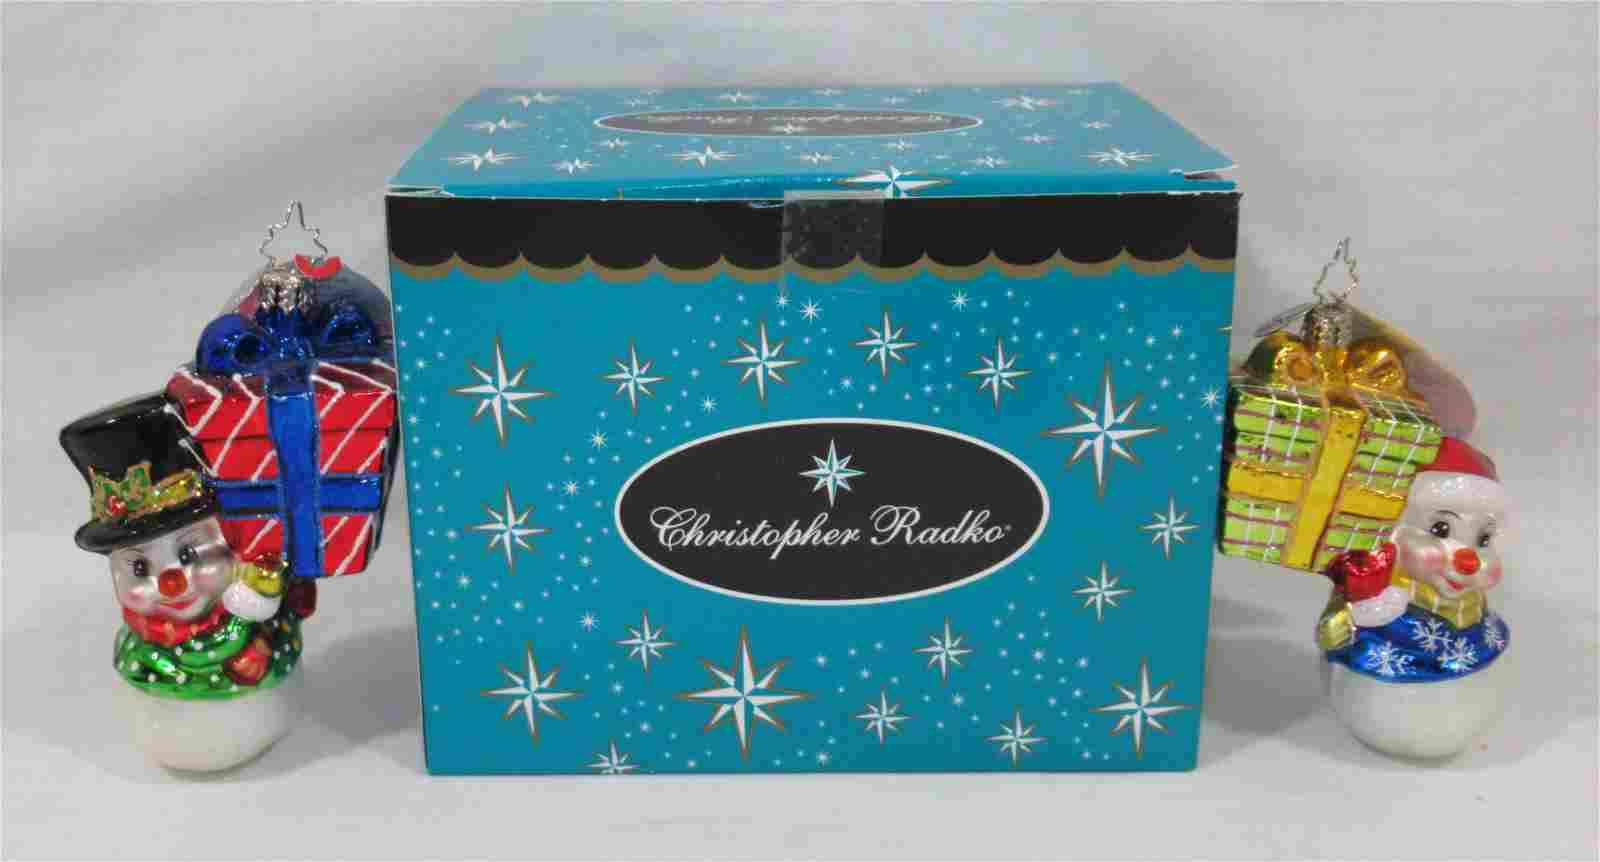 2 Christopher Radko Christmas Ornament N.I.B.